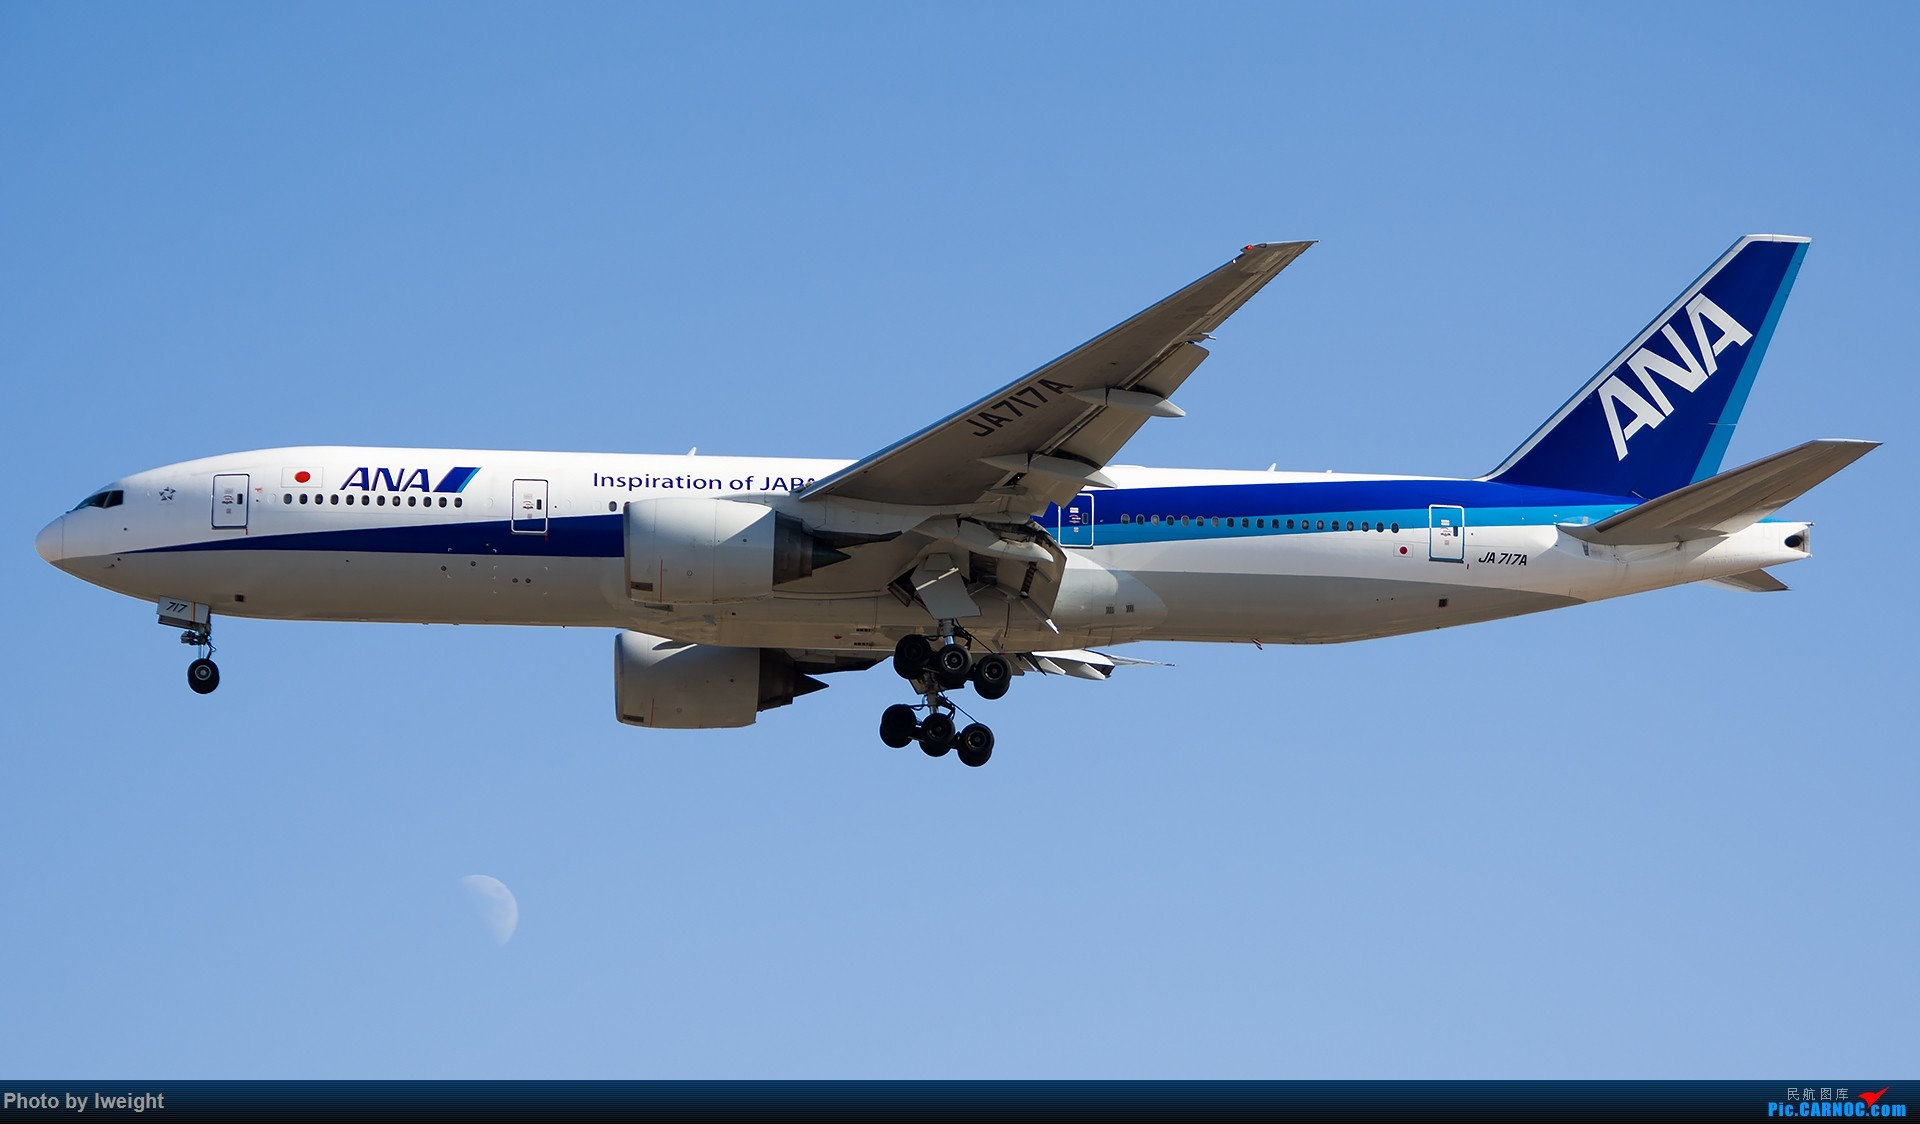 Re:[原创]北京难得的好天气,随手拍了一些渣图【2015-01-27】 BOEING 777-200 JA717A 中国北京首都国际机场